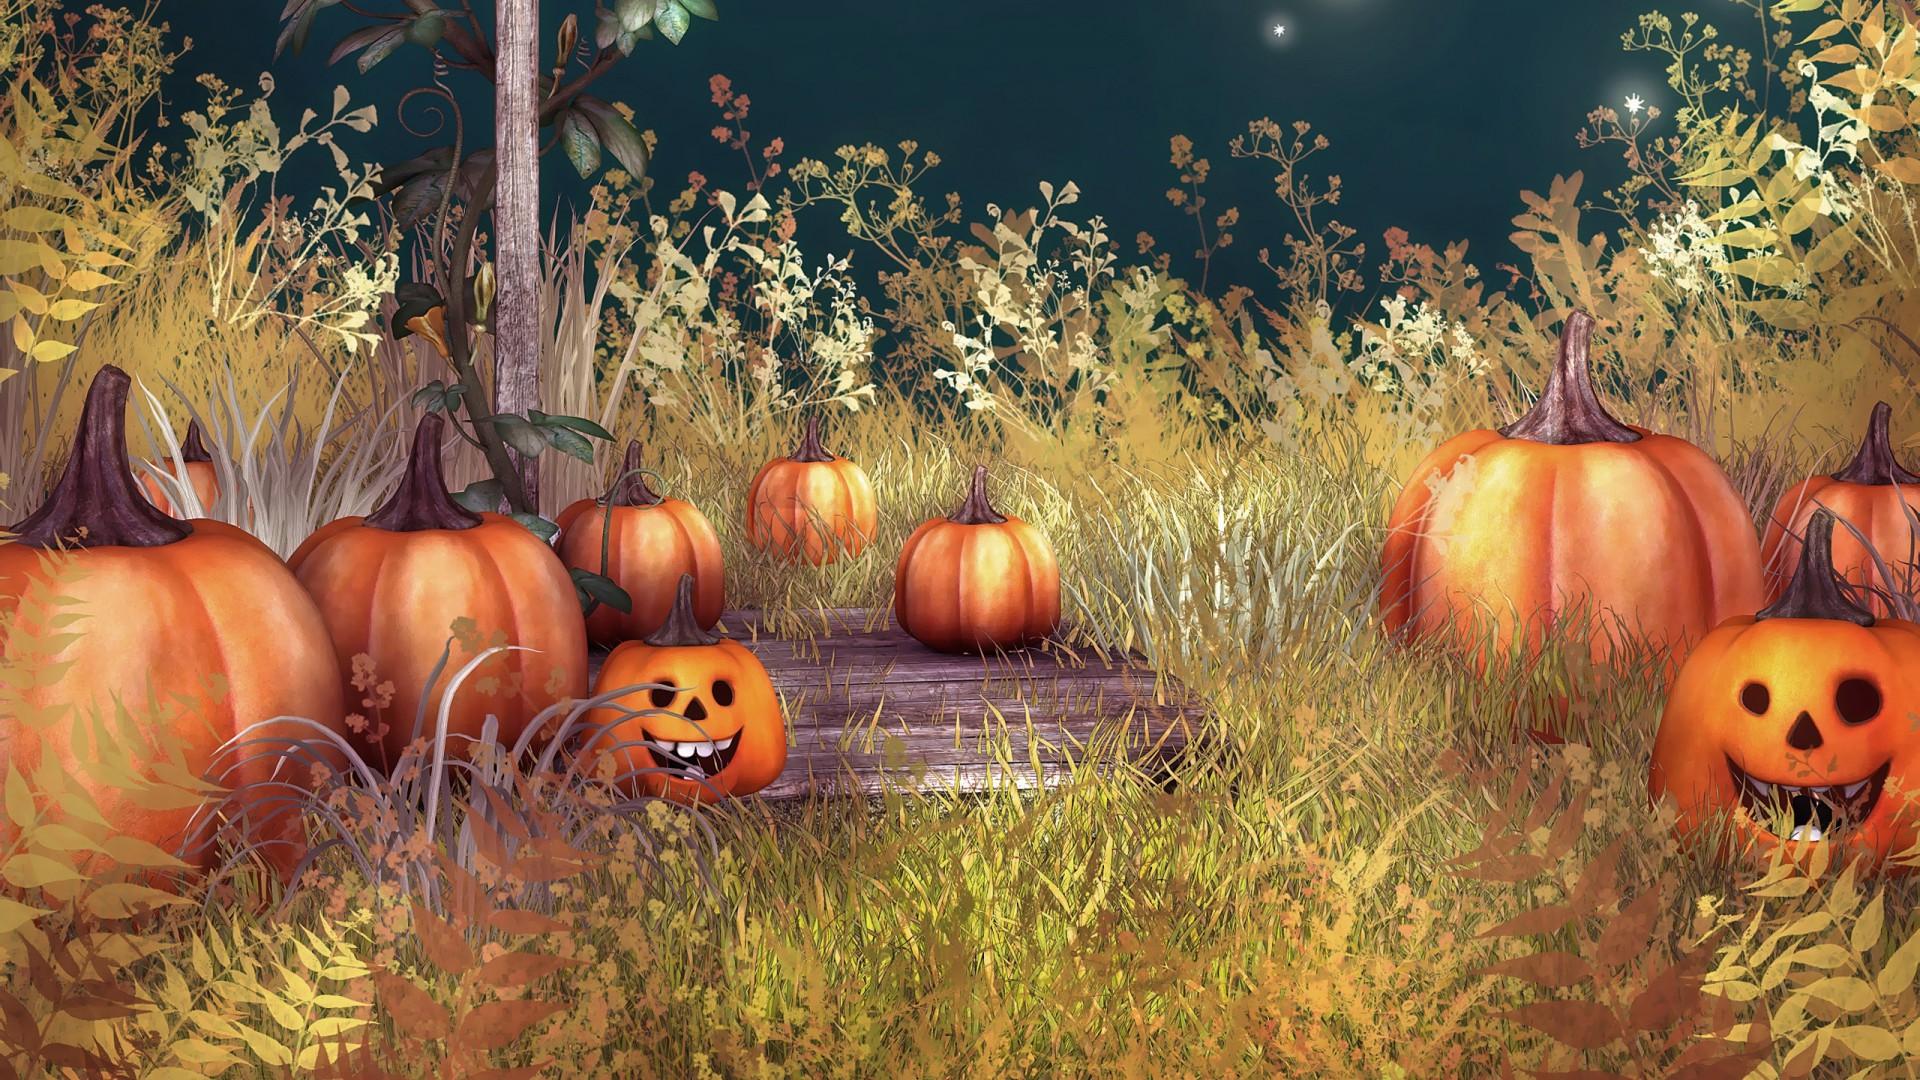 halloween_pumpkins-wallpaper-2560×1600-dusicky-obrazky-na-plochu